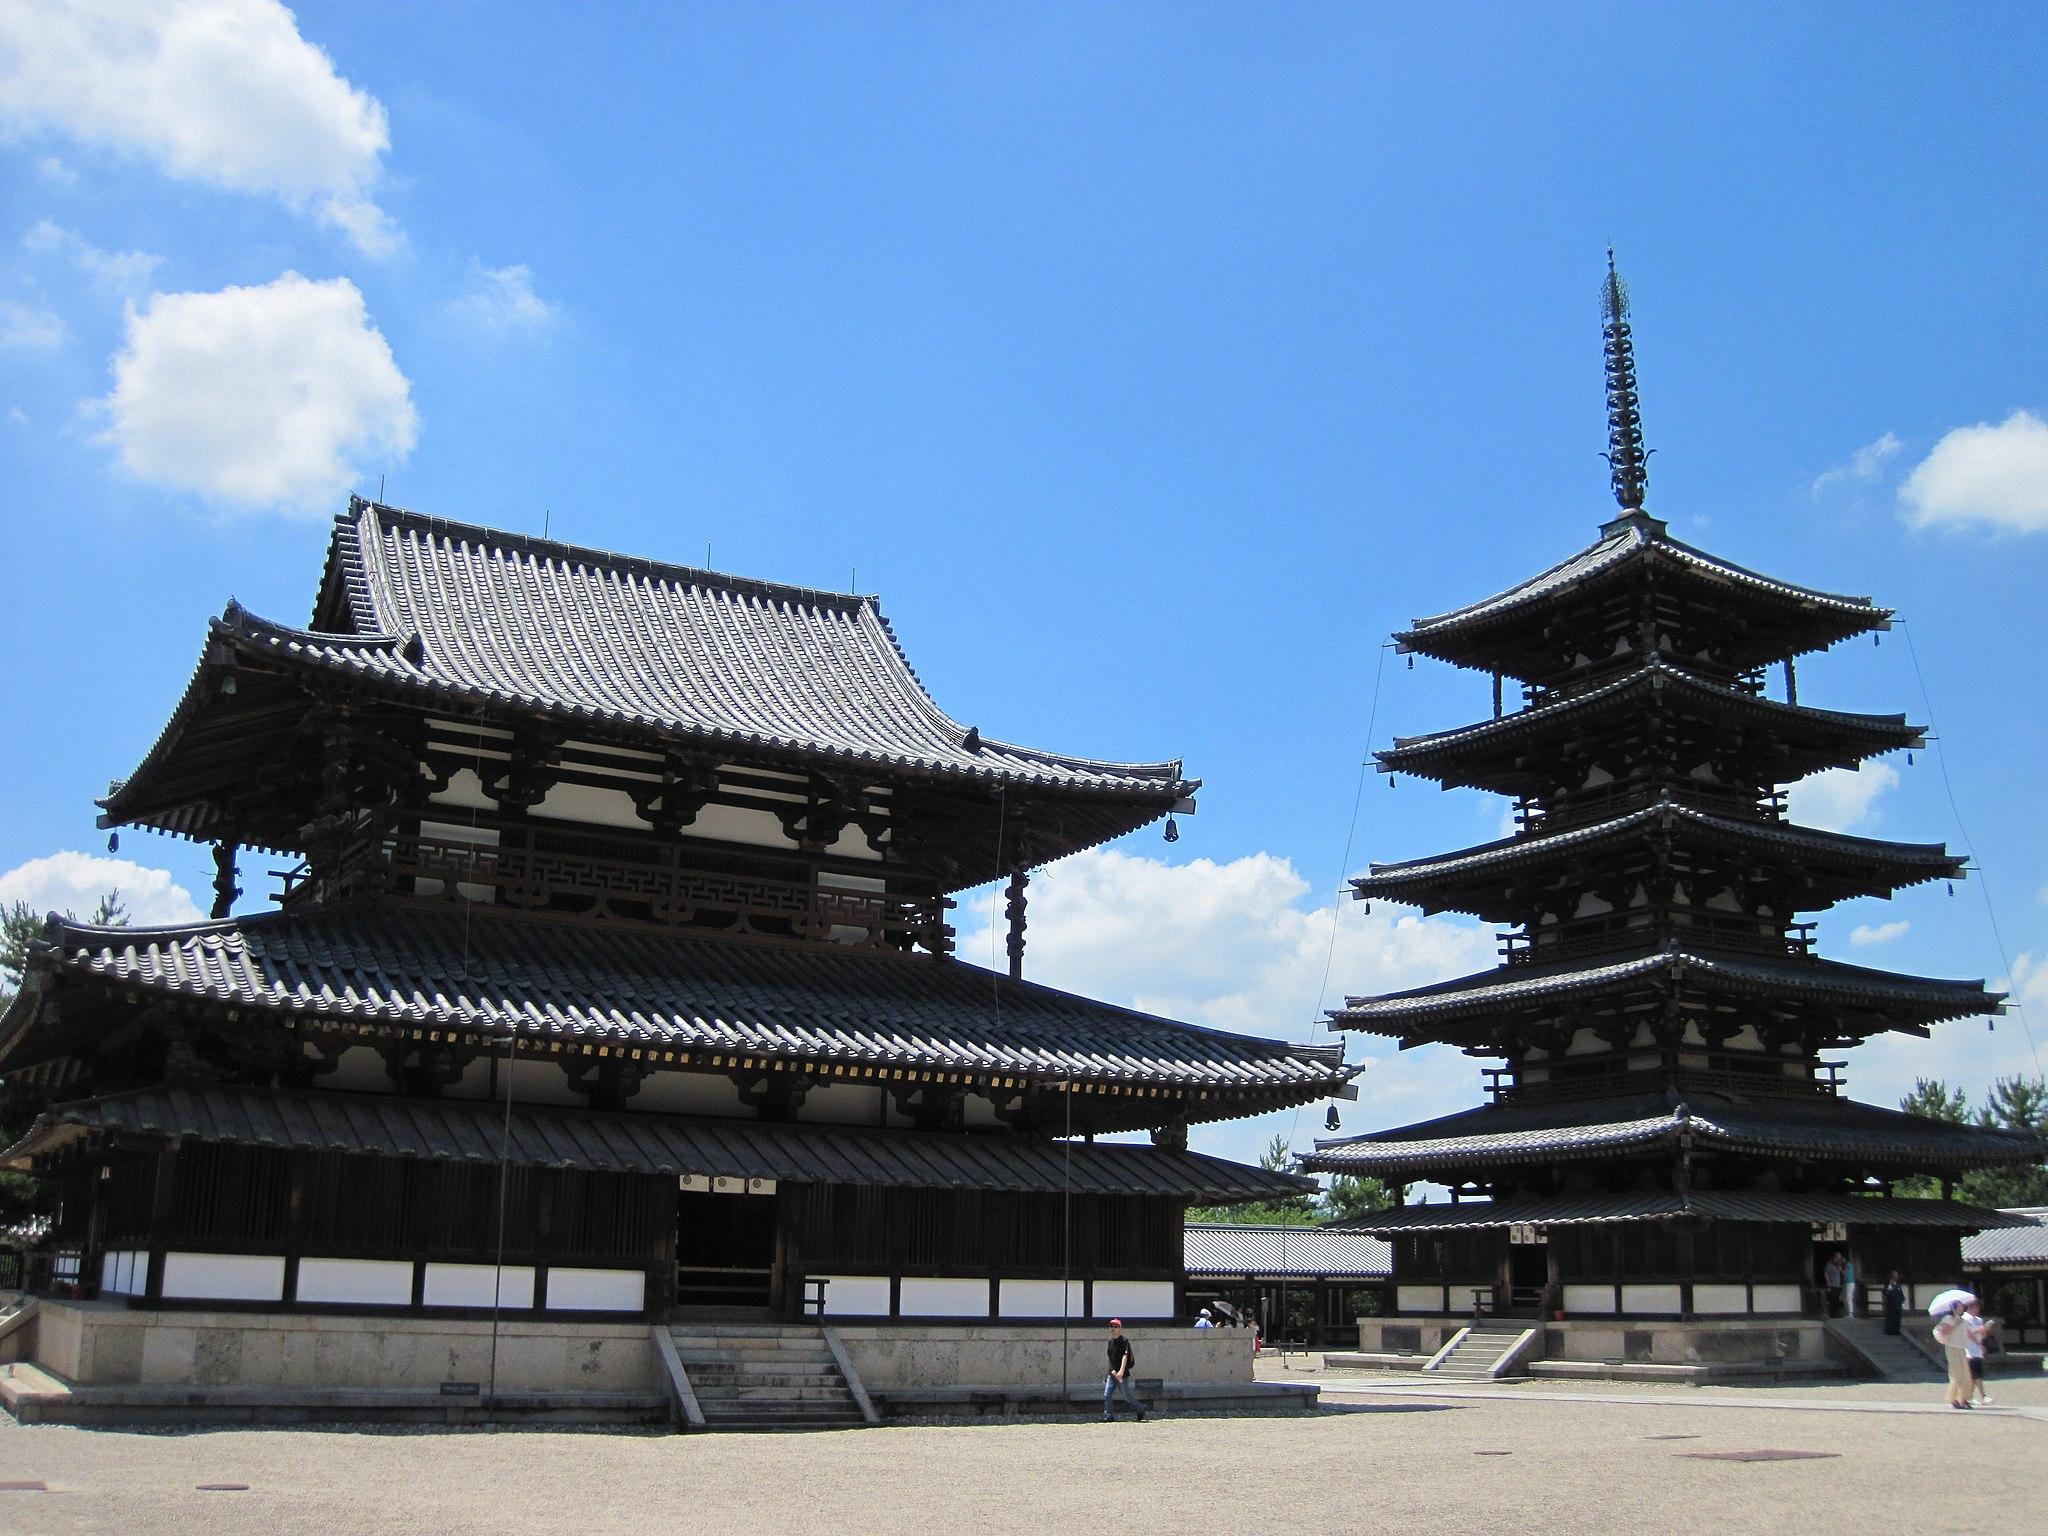 2048px-Horyu-ji_National_Treasure_World_heritage_国宝・世界遺産法隆寺85